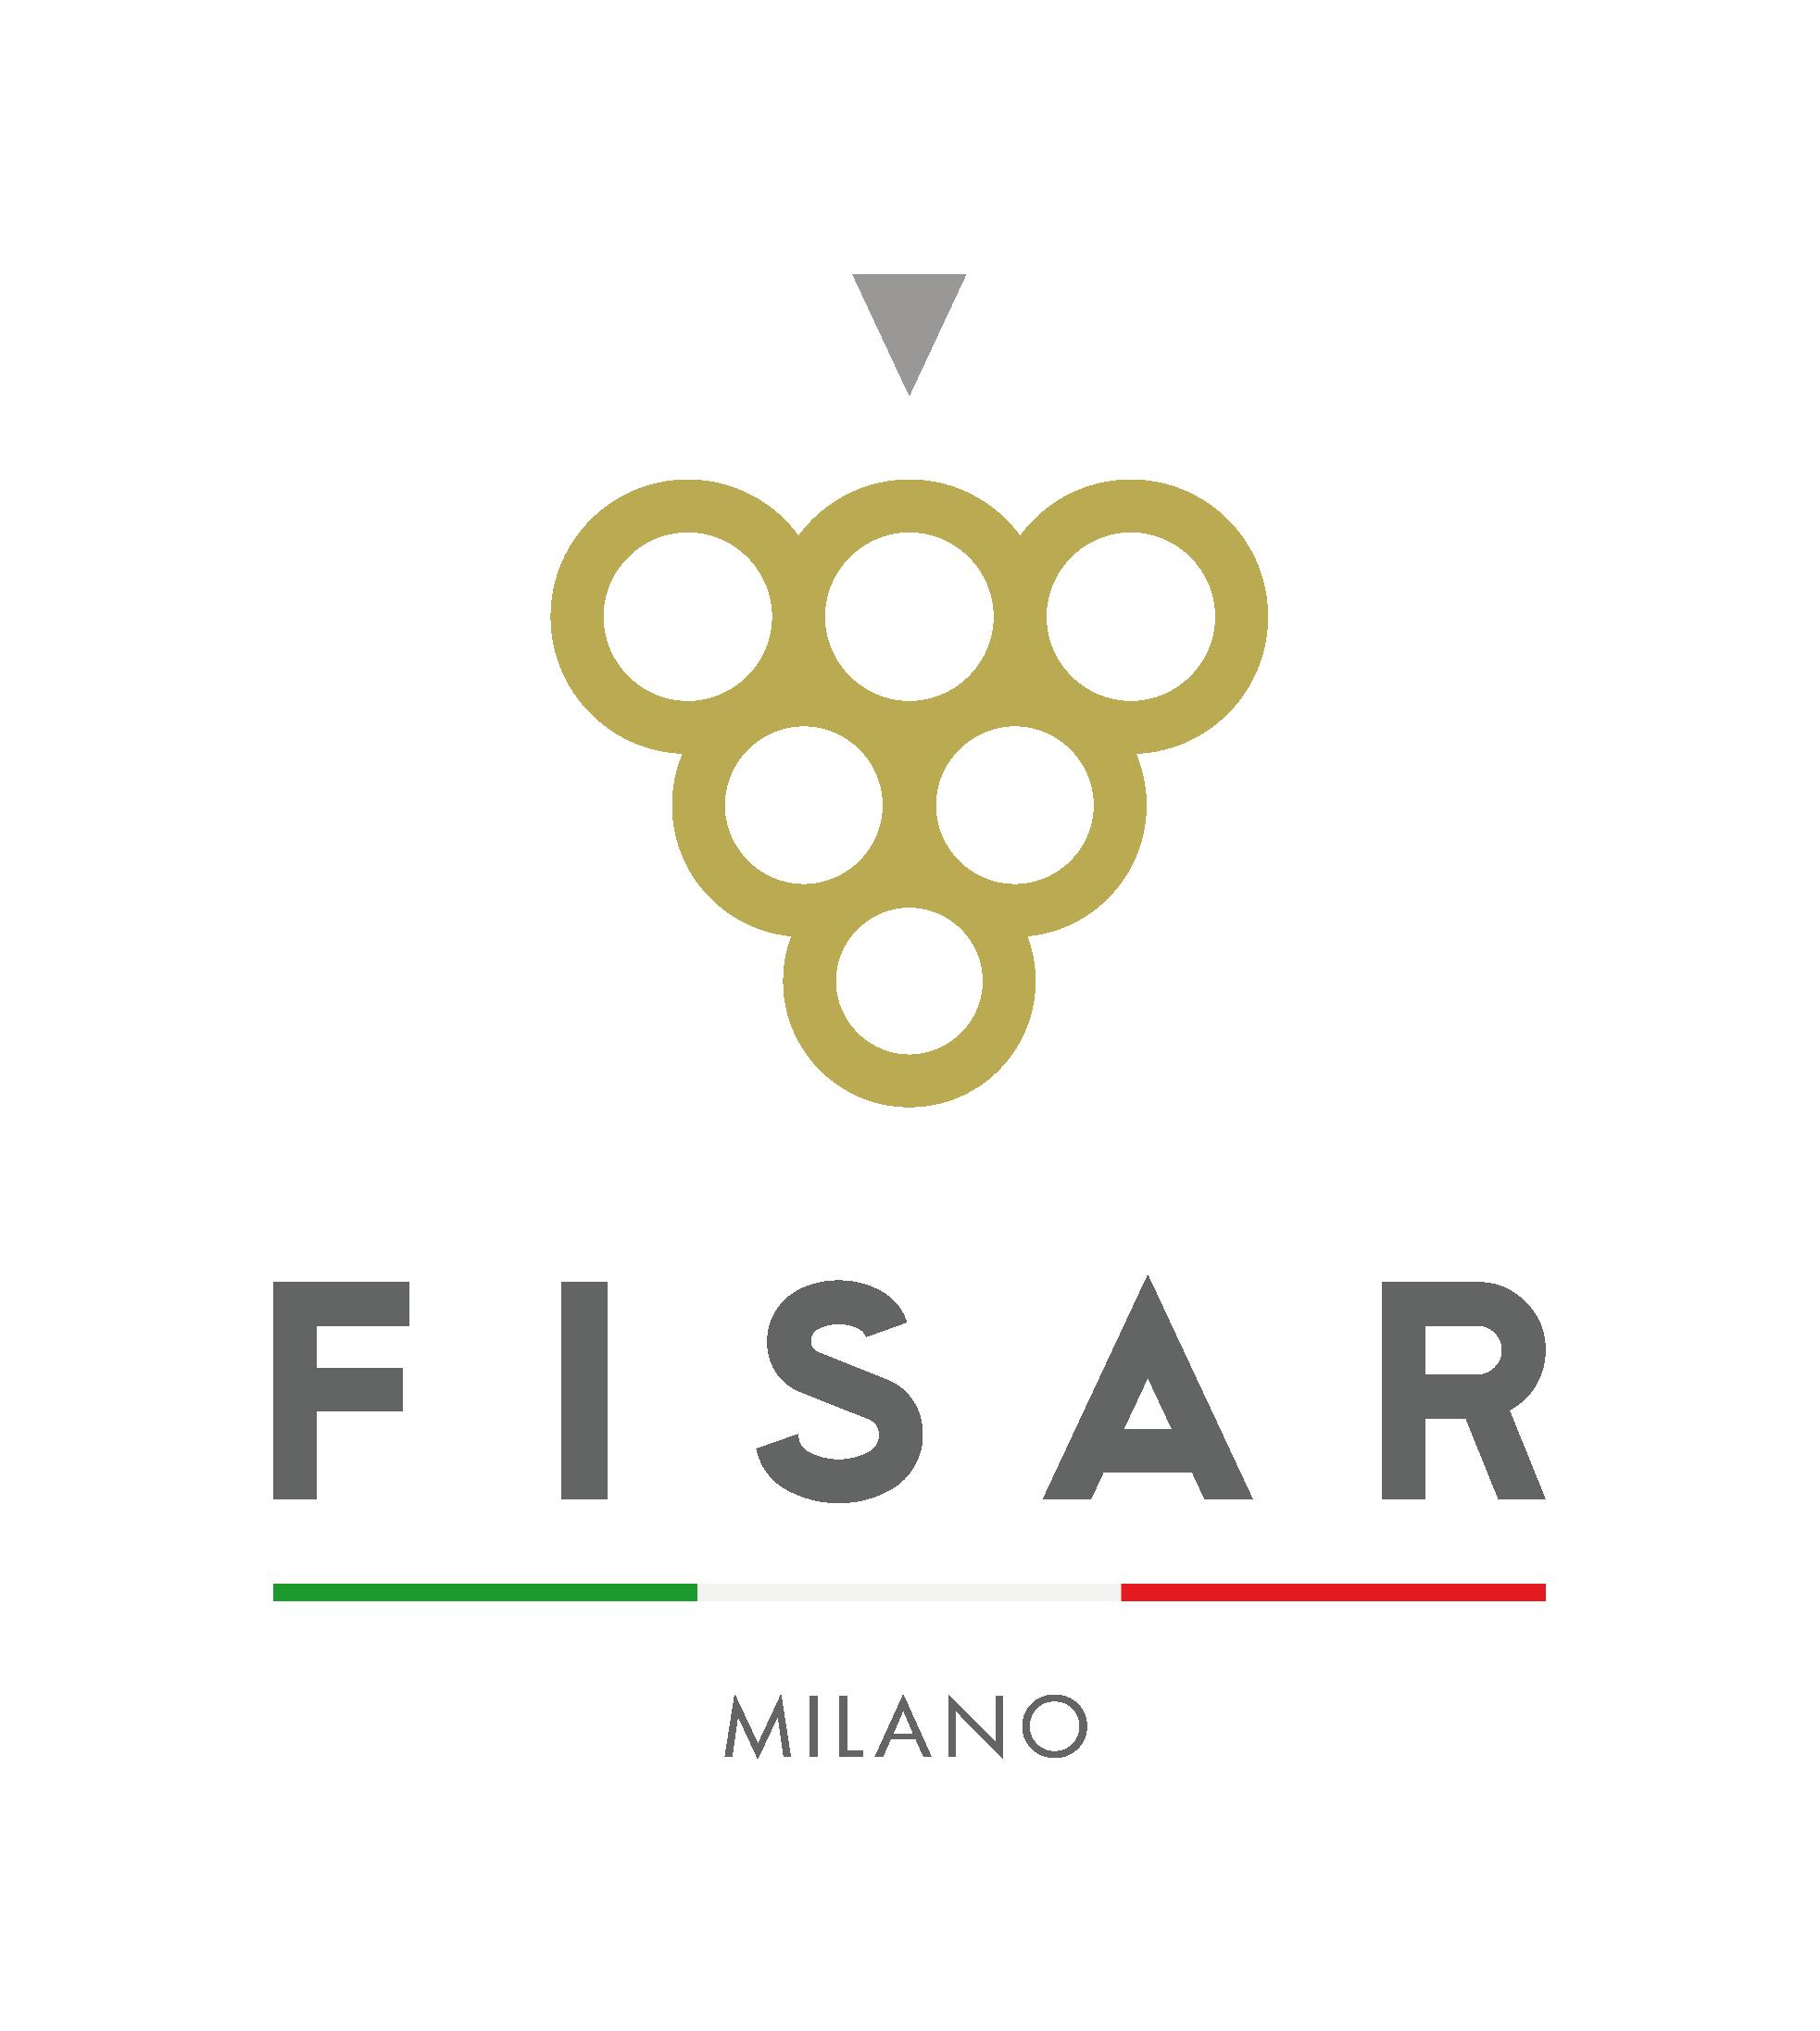 http://fisarmilano.org/magazine/wp-content/uploads/sites/5/2018/01/fisar_milano-01.png